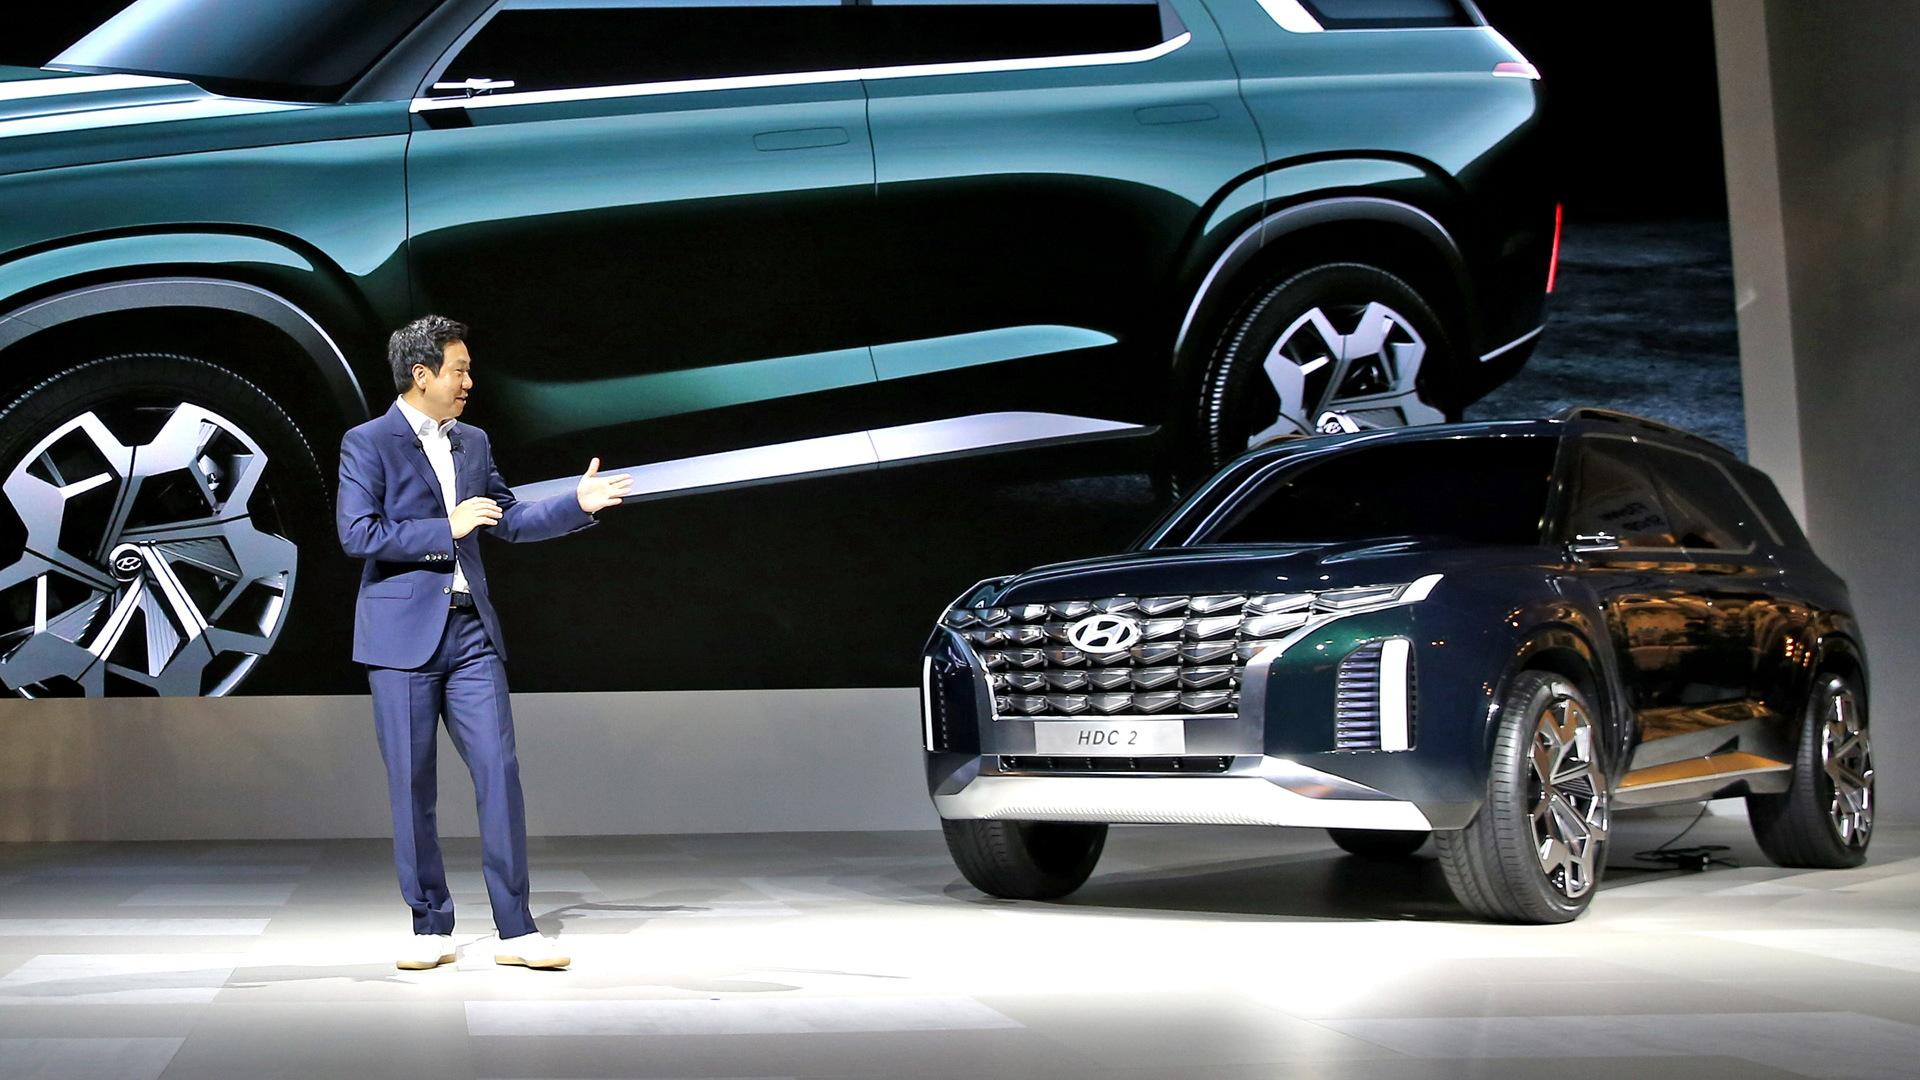 Hyundai Grandmaster concept